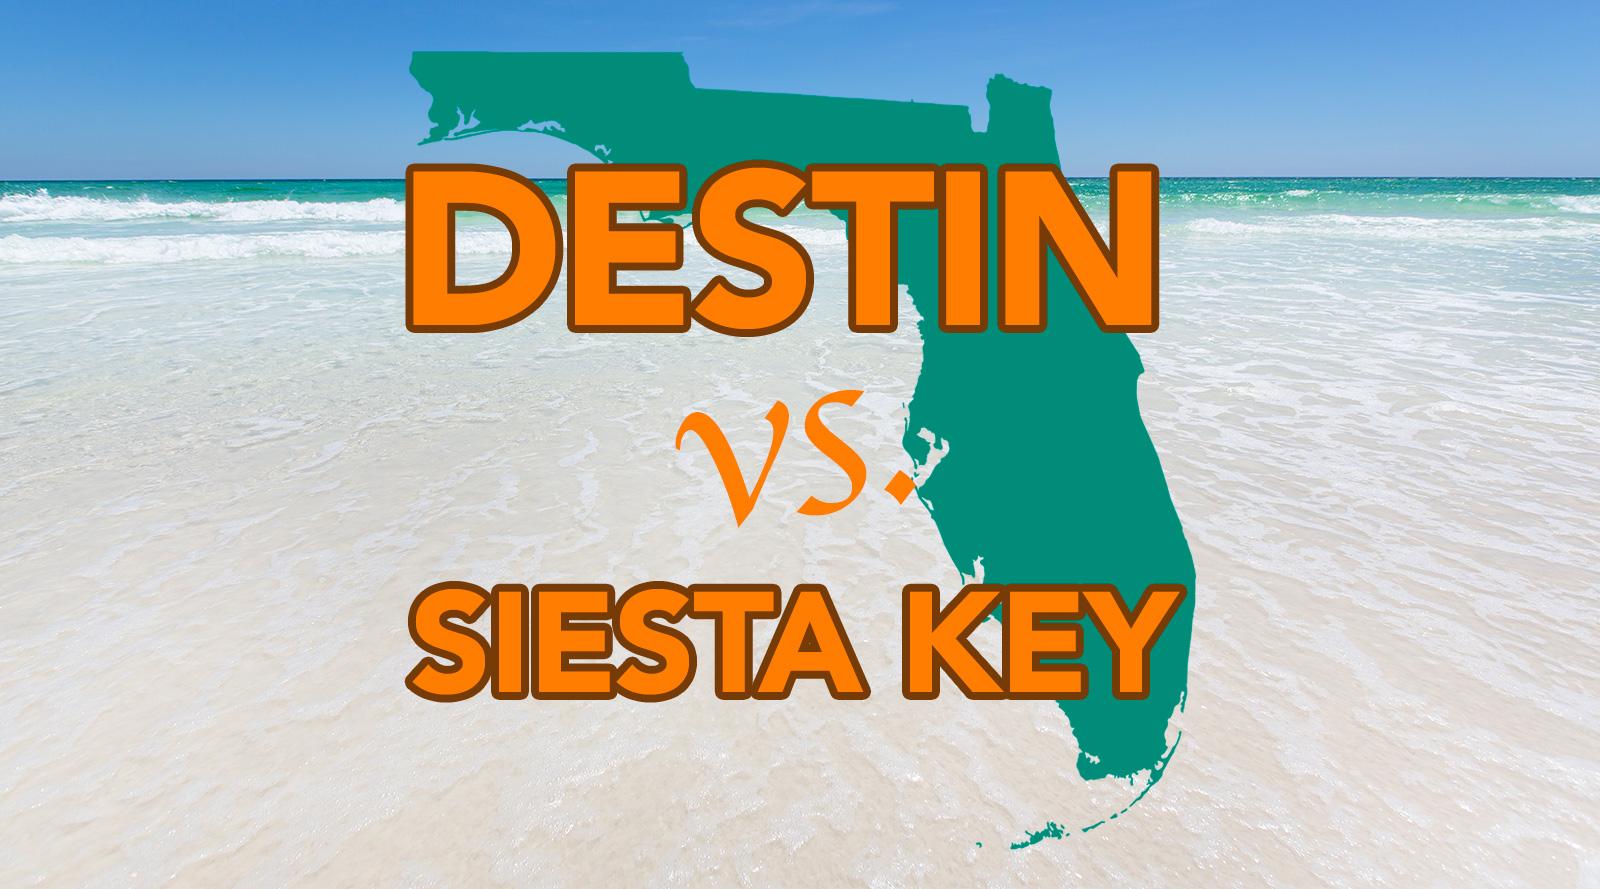 Destin vs Siesta Key